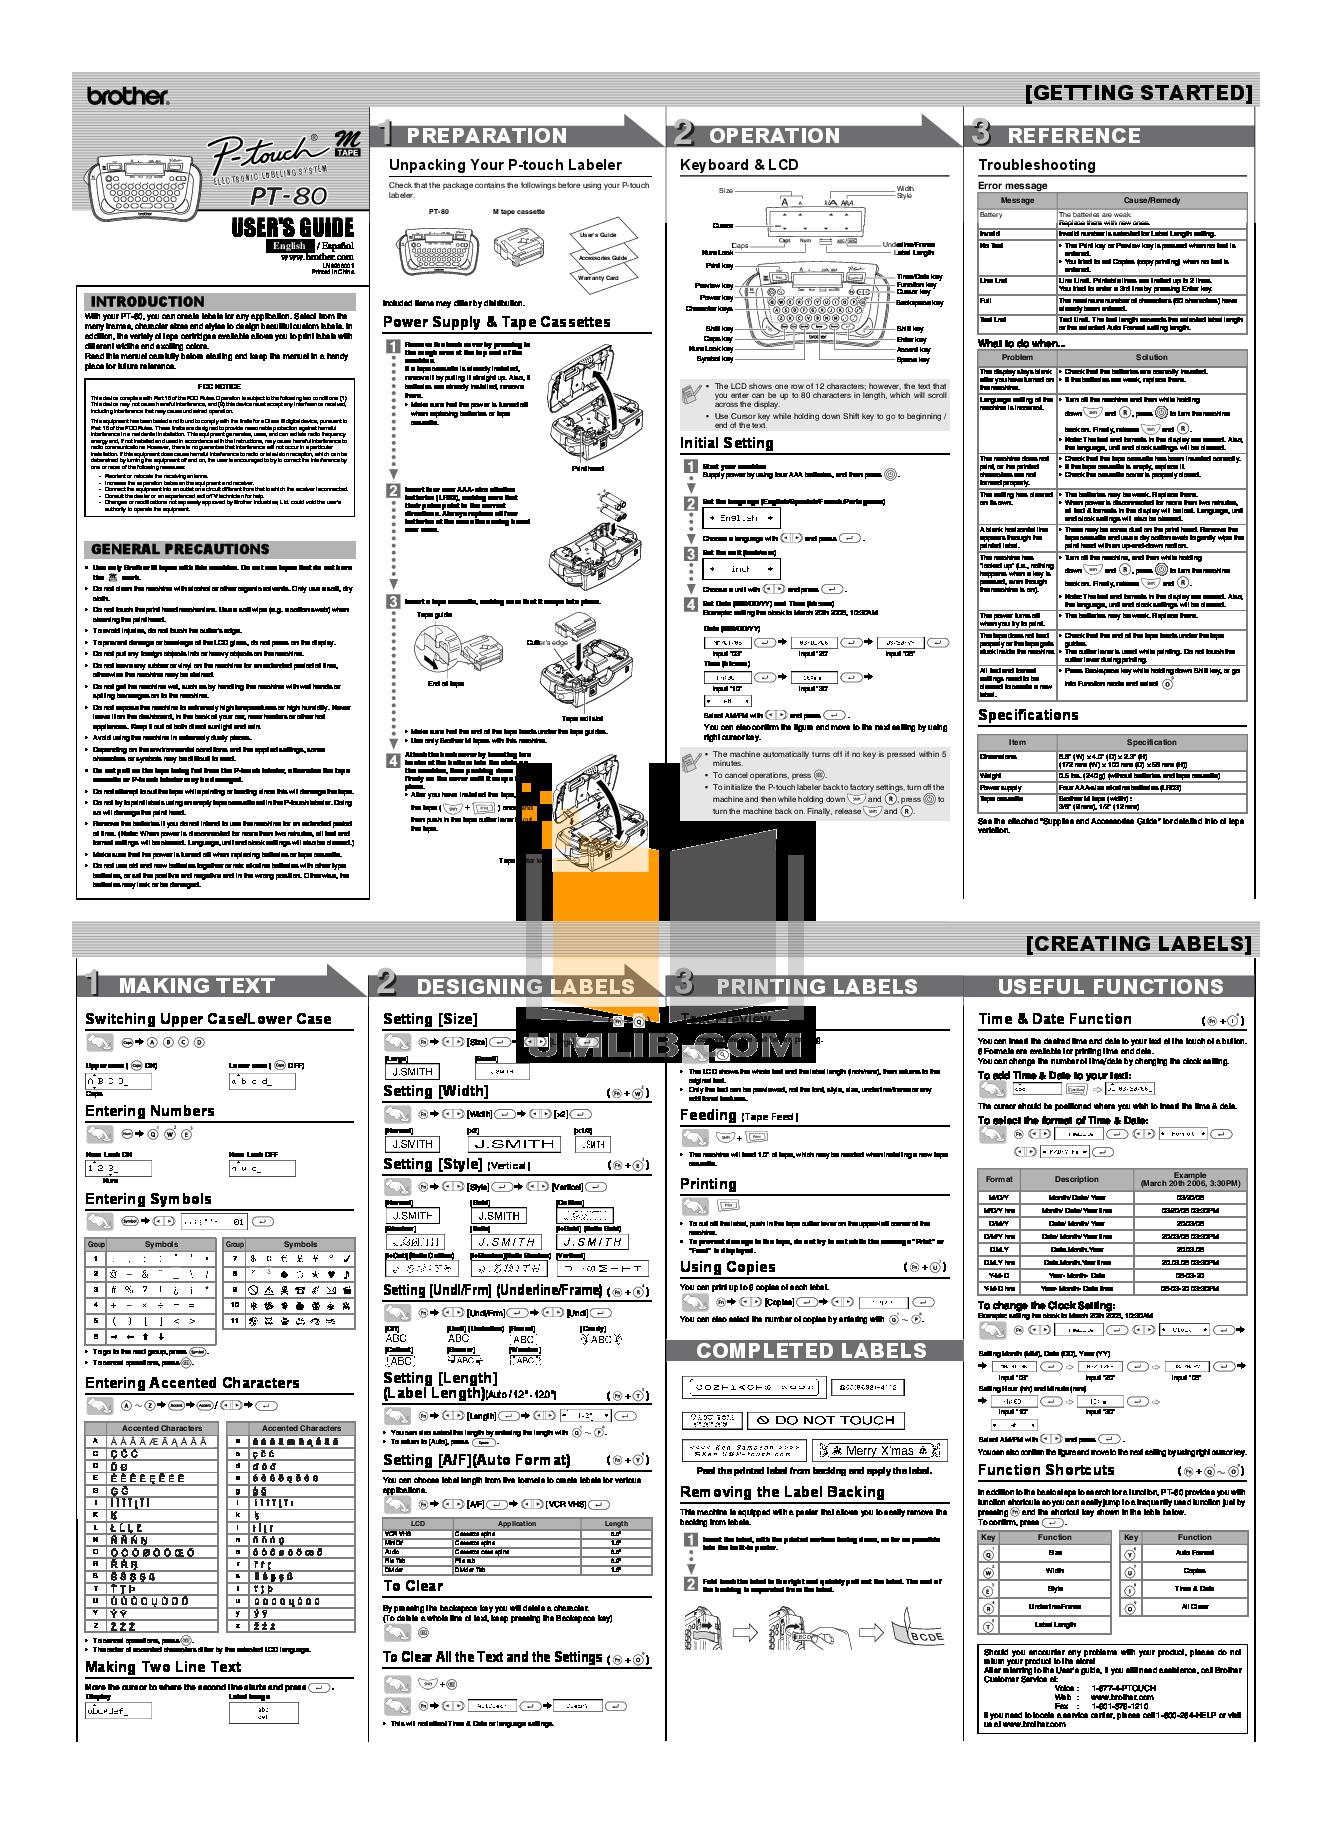 pdf for Brother Printer PT-100 manual